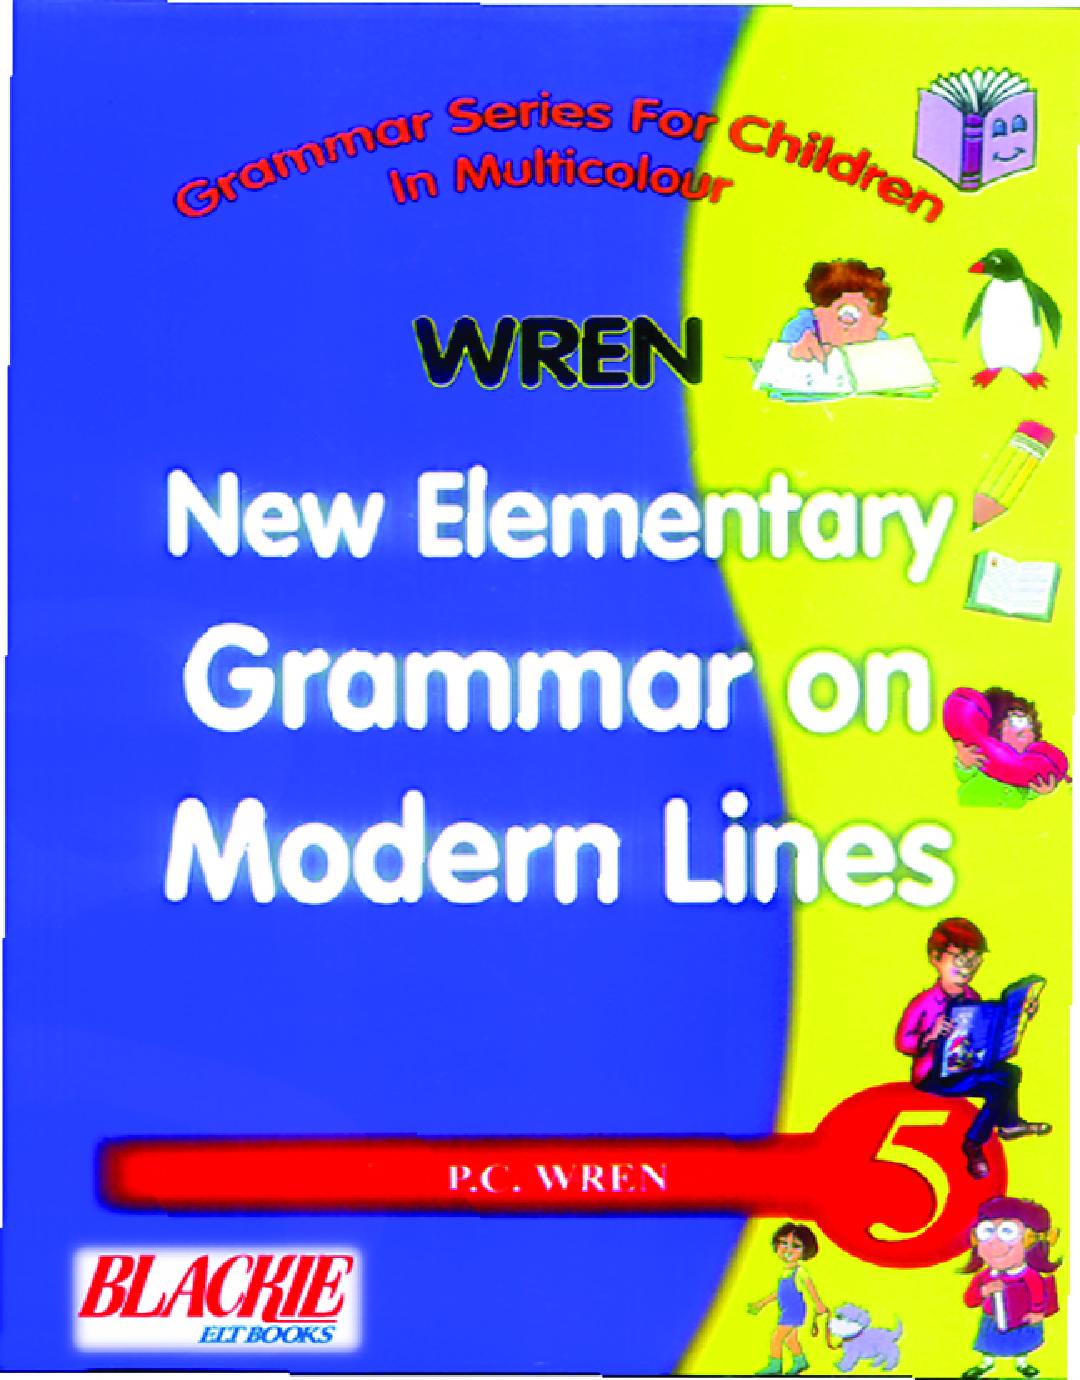 Wren New Elementary Grammar On Modern Lines 5 - Page 1